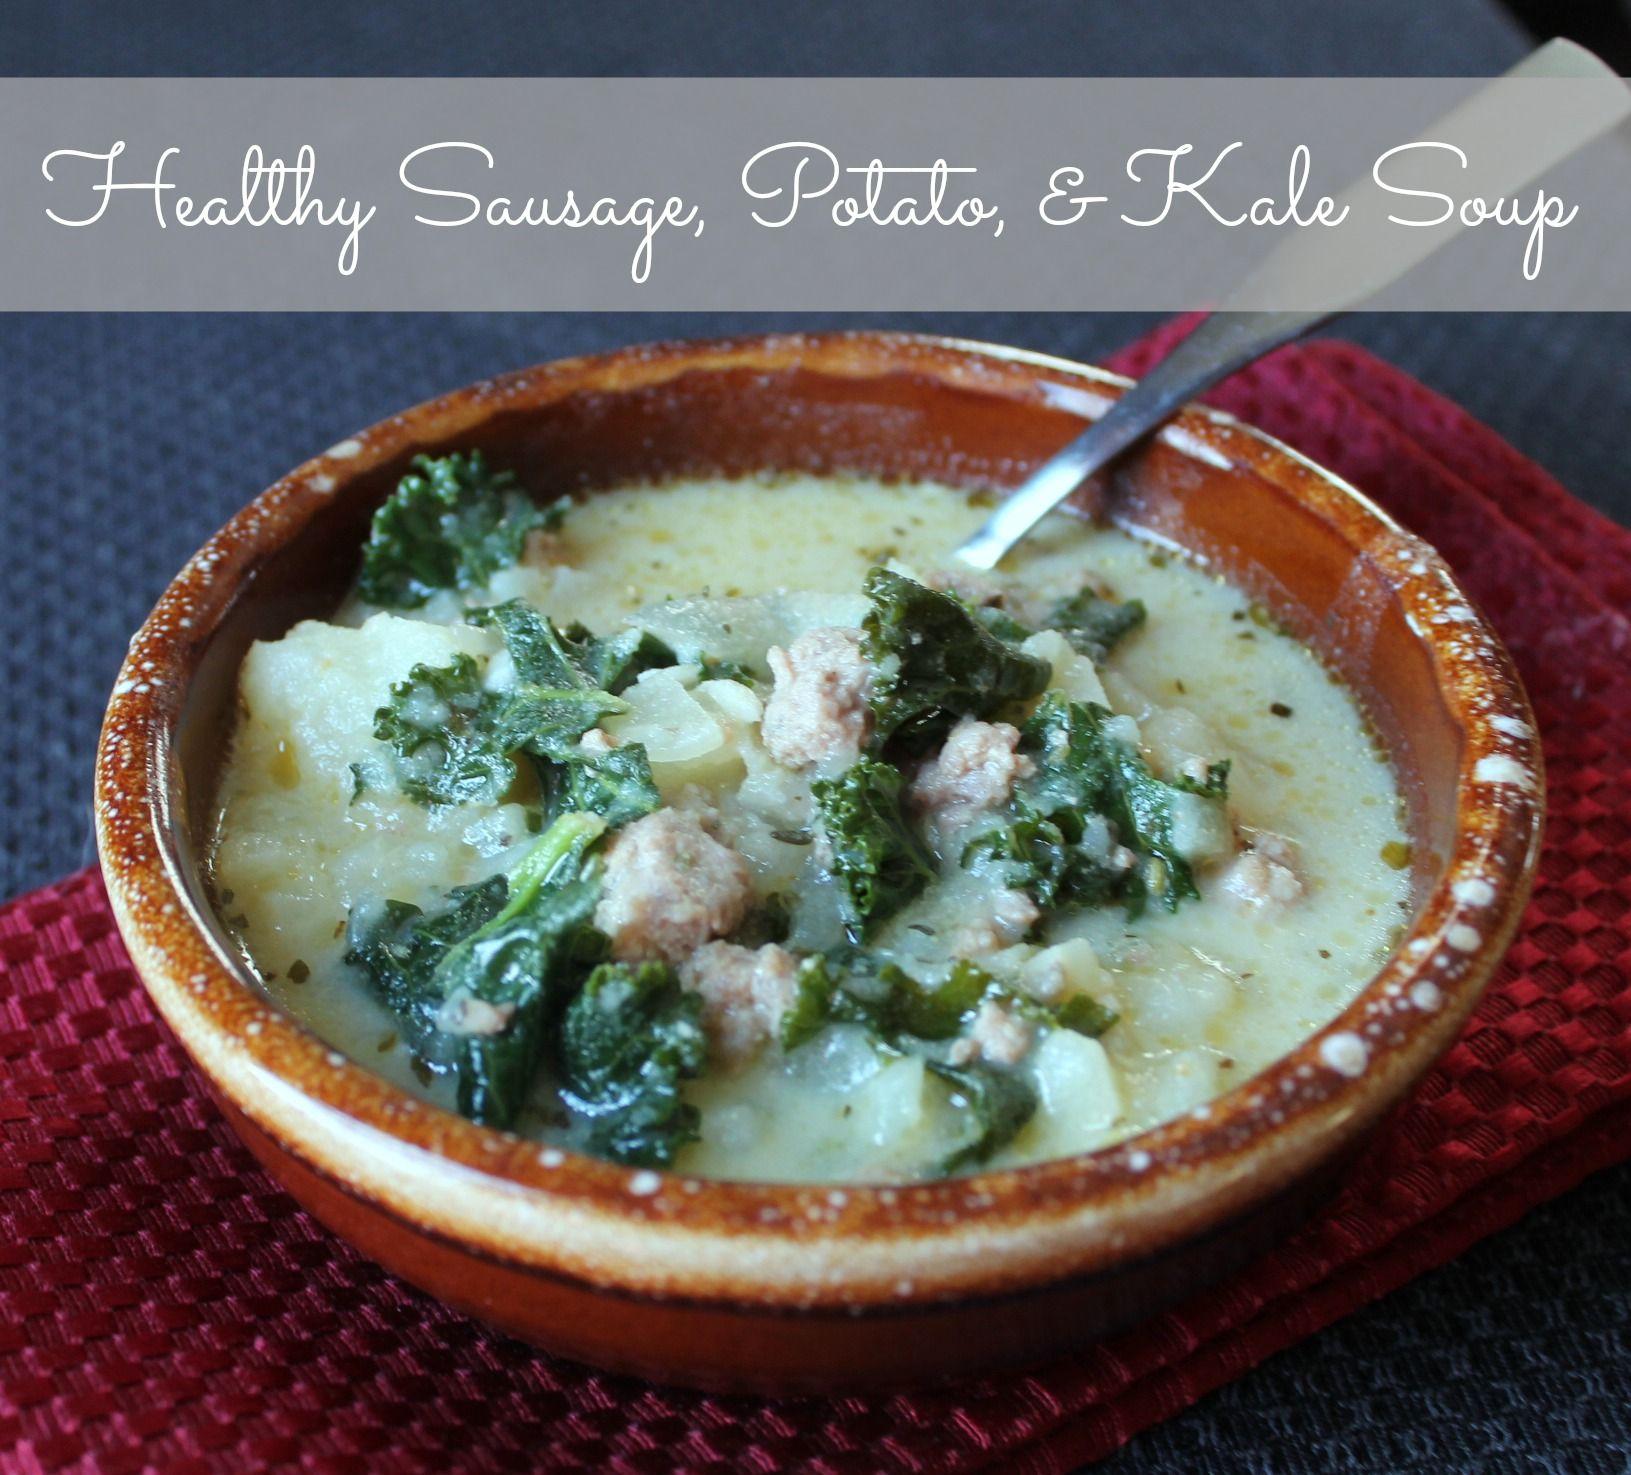 sausage potato and kale soup copycat zuppa toscana olive garden recipe - Olive Garden Kale Soup